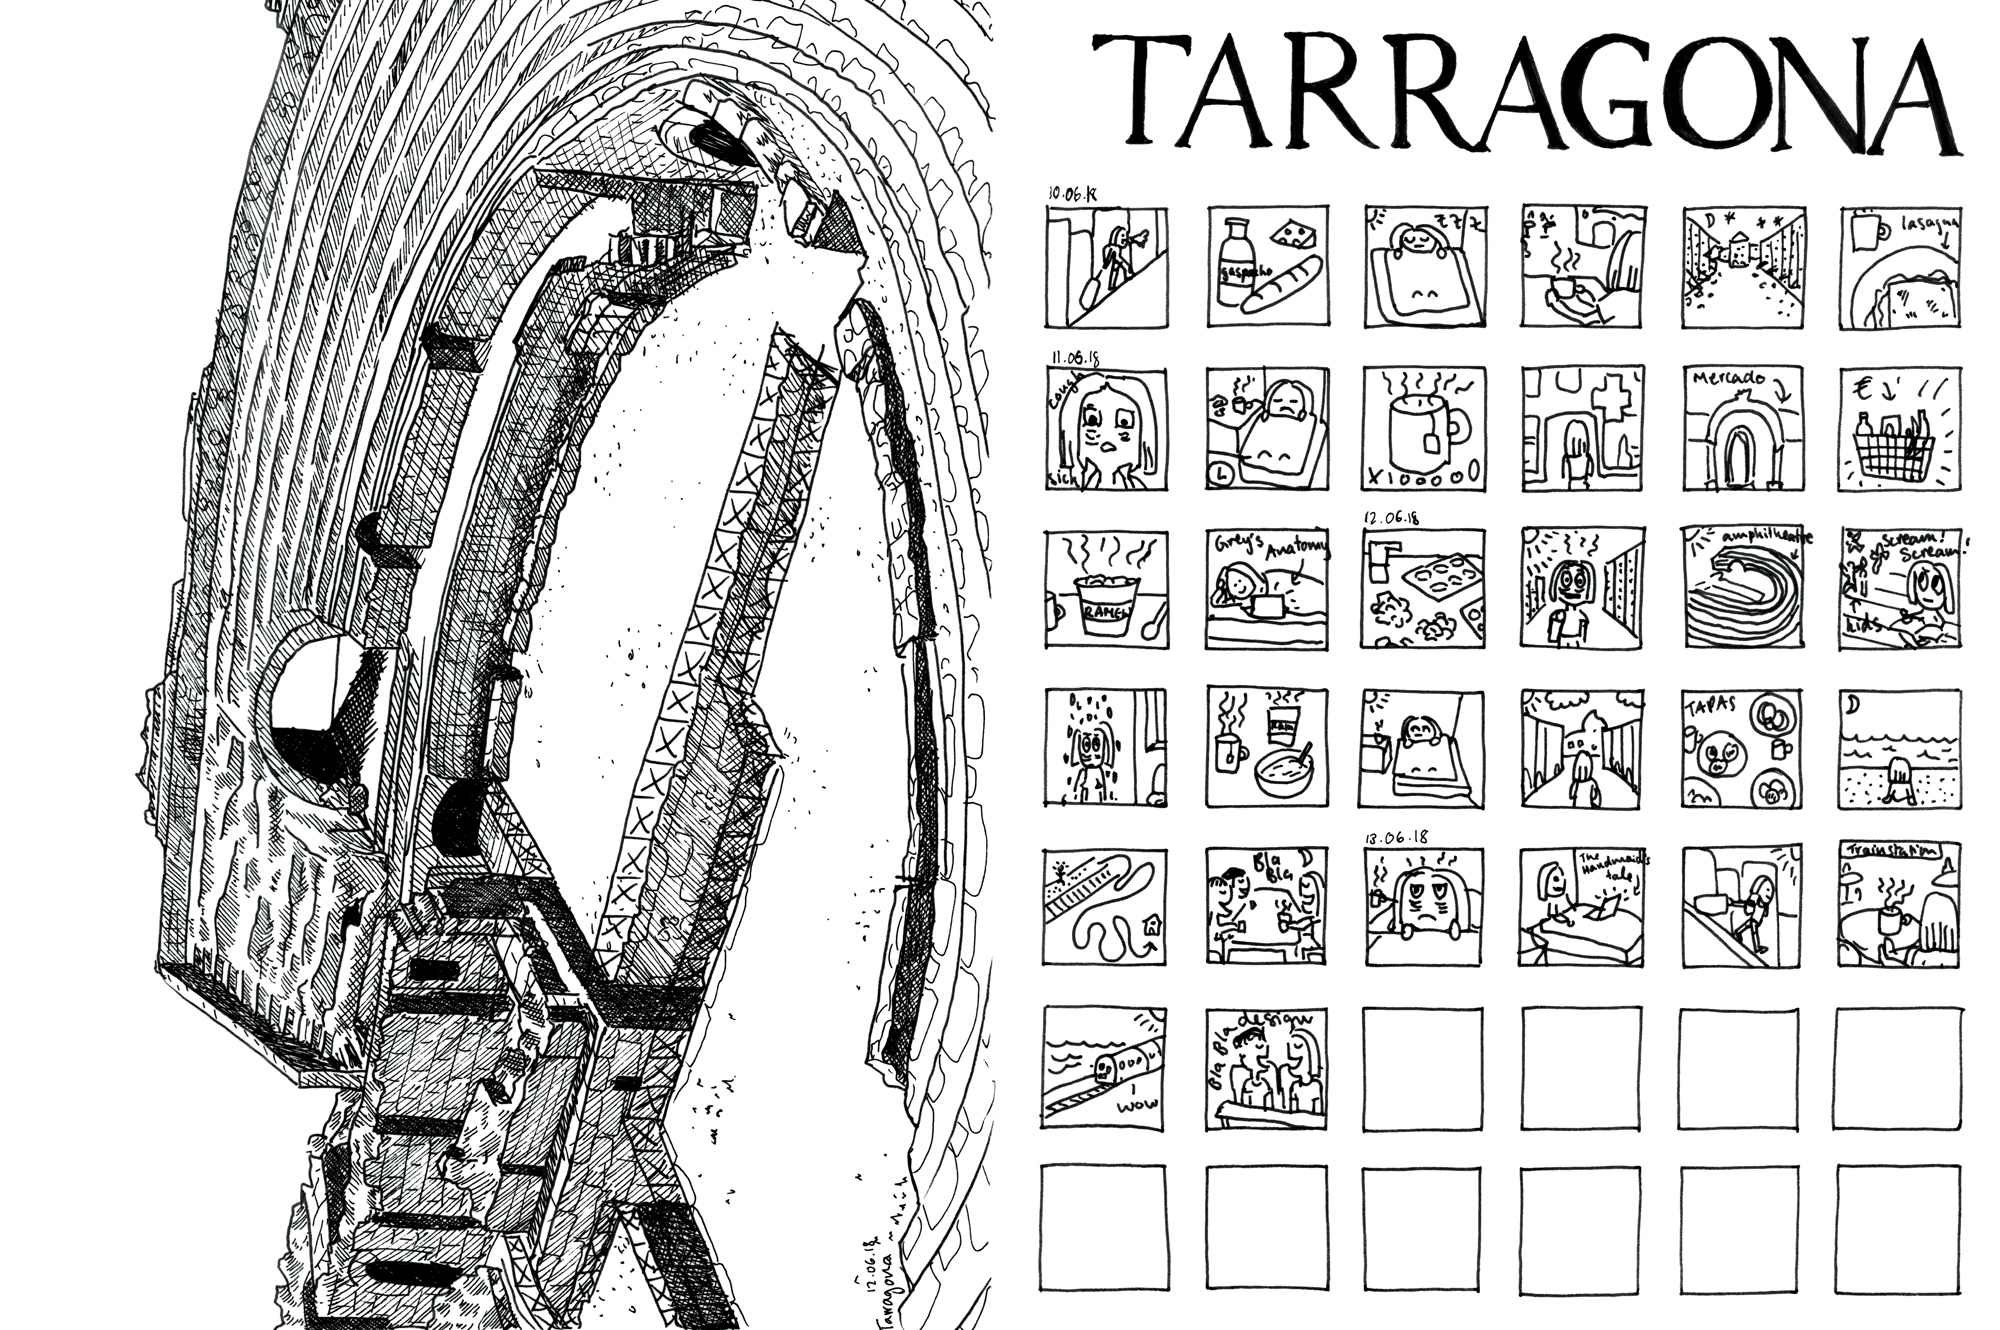 37_tarragona_amphitheatre_comic_web.jpg